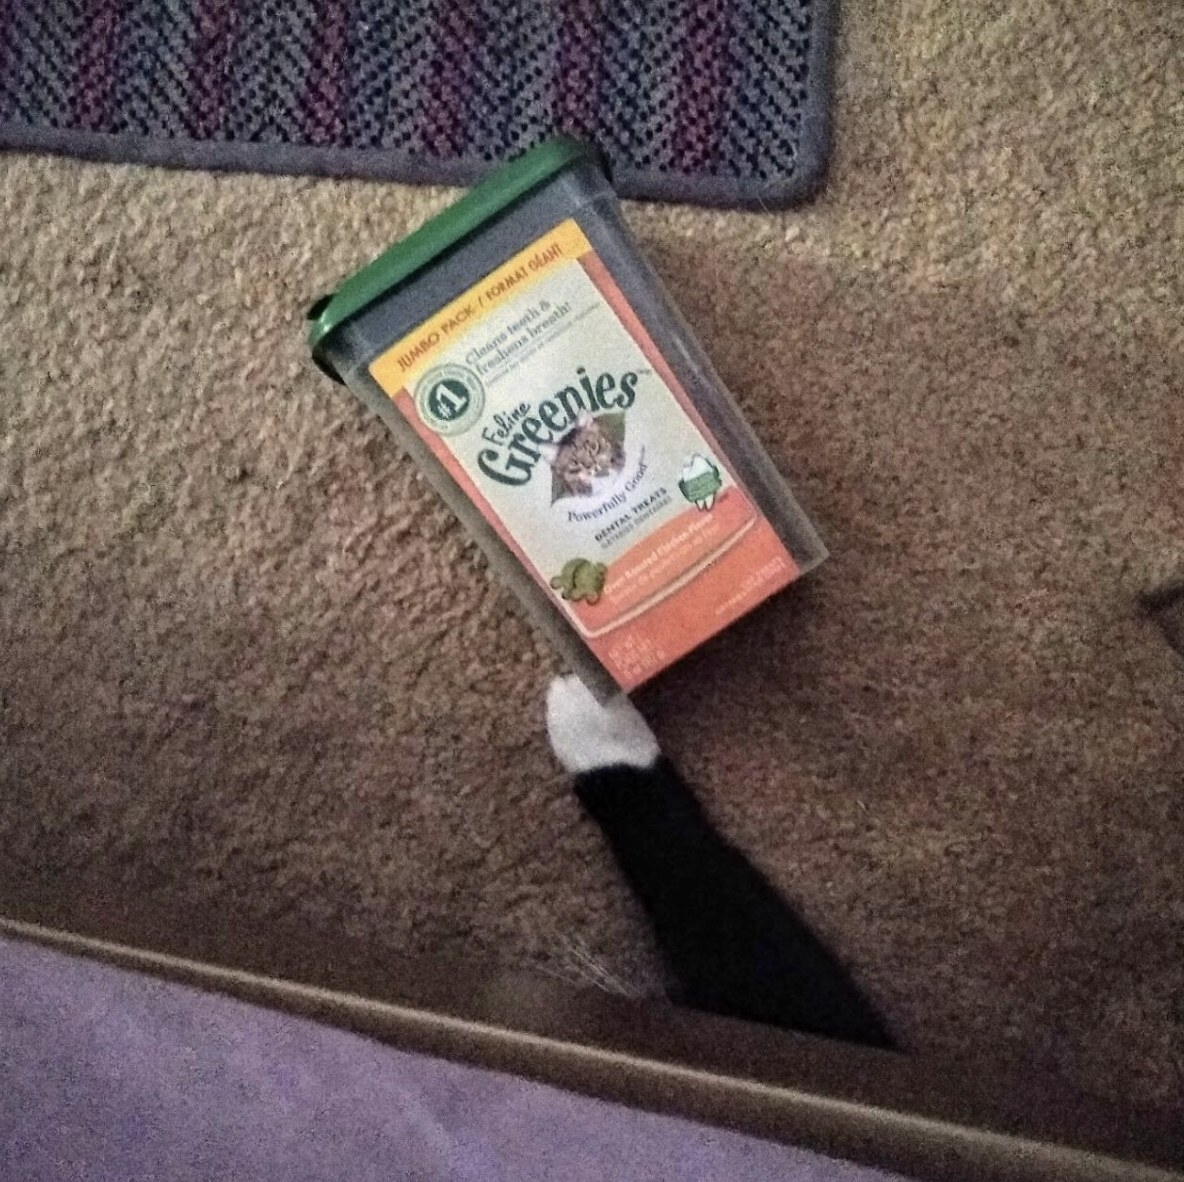 a cat's paw grabbing the box of greenies treats